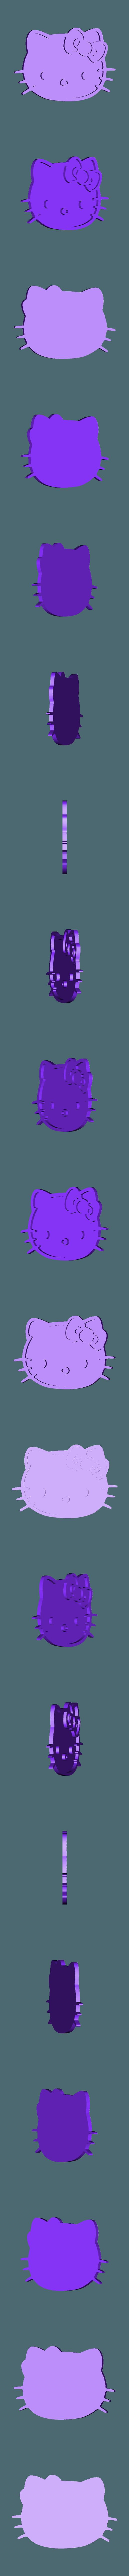 HelloKitty.stl Télécharger fichier STL gratuit Hello Kitty • Plan pour imprimante 3D, yb__magiic